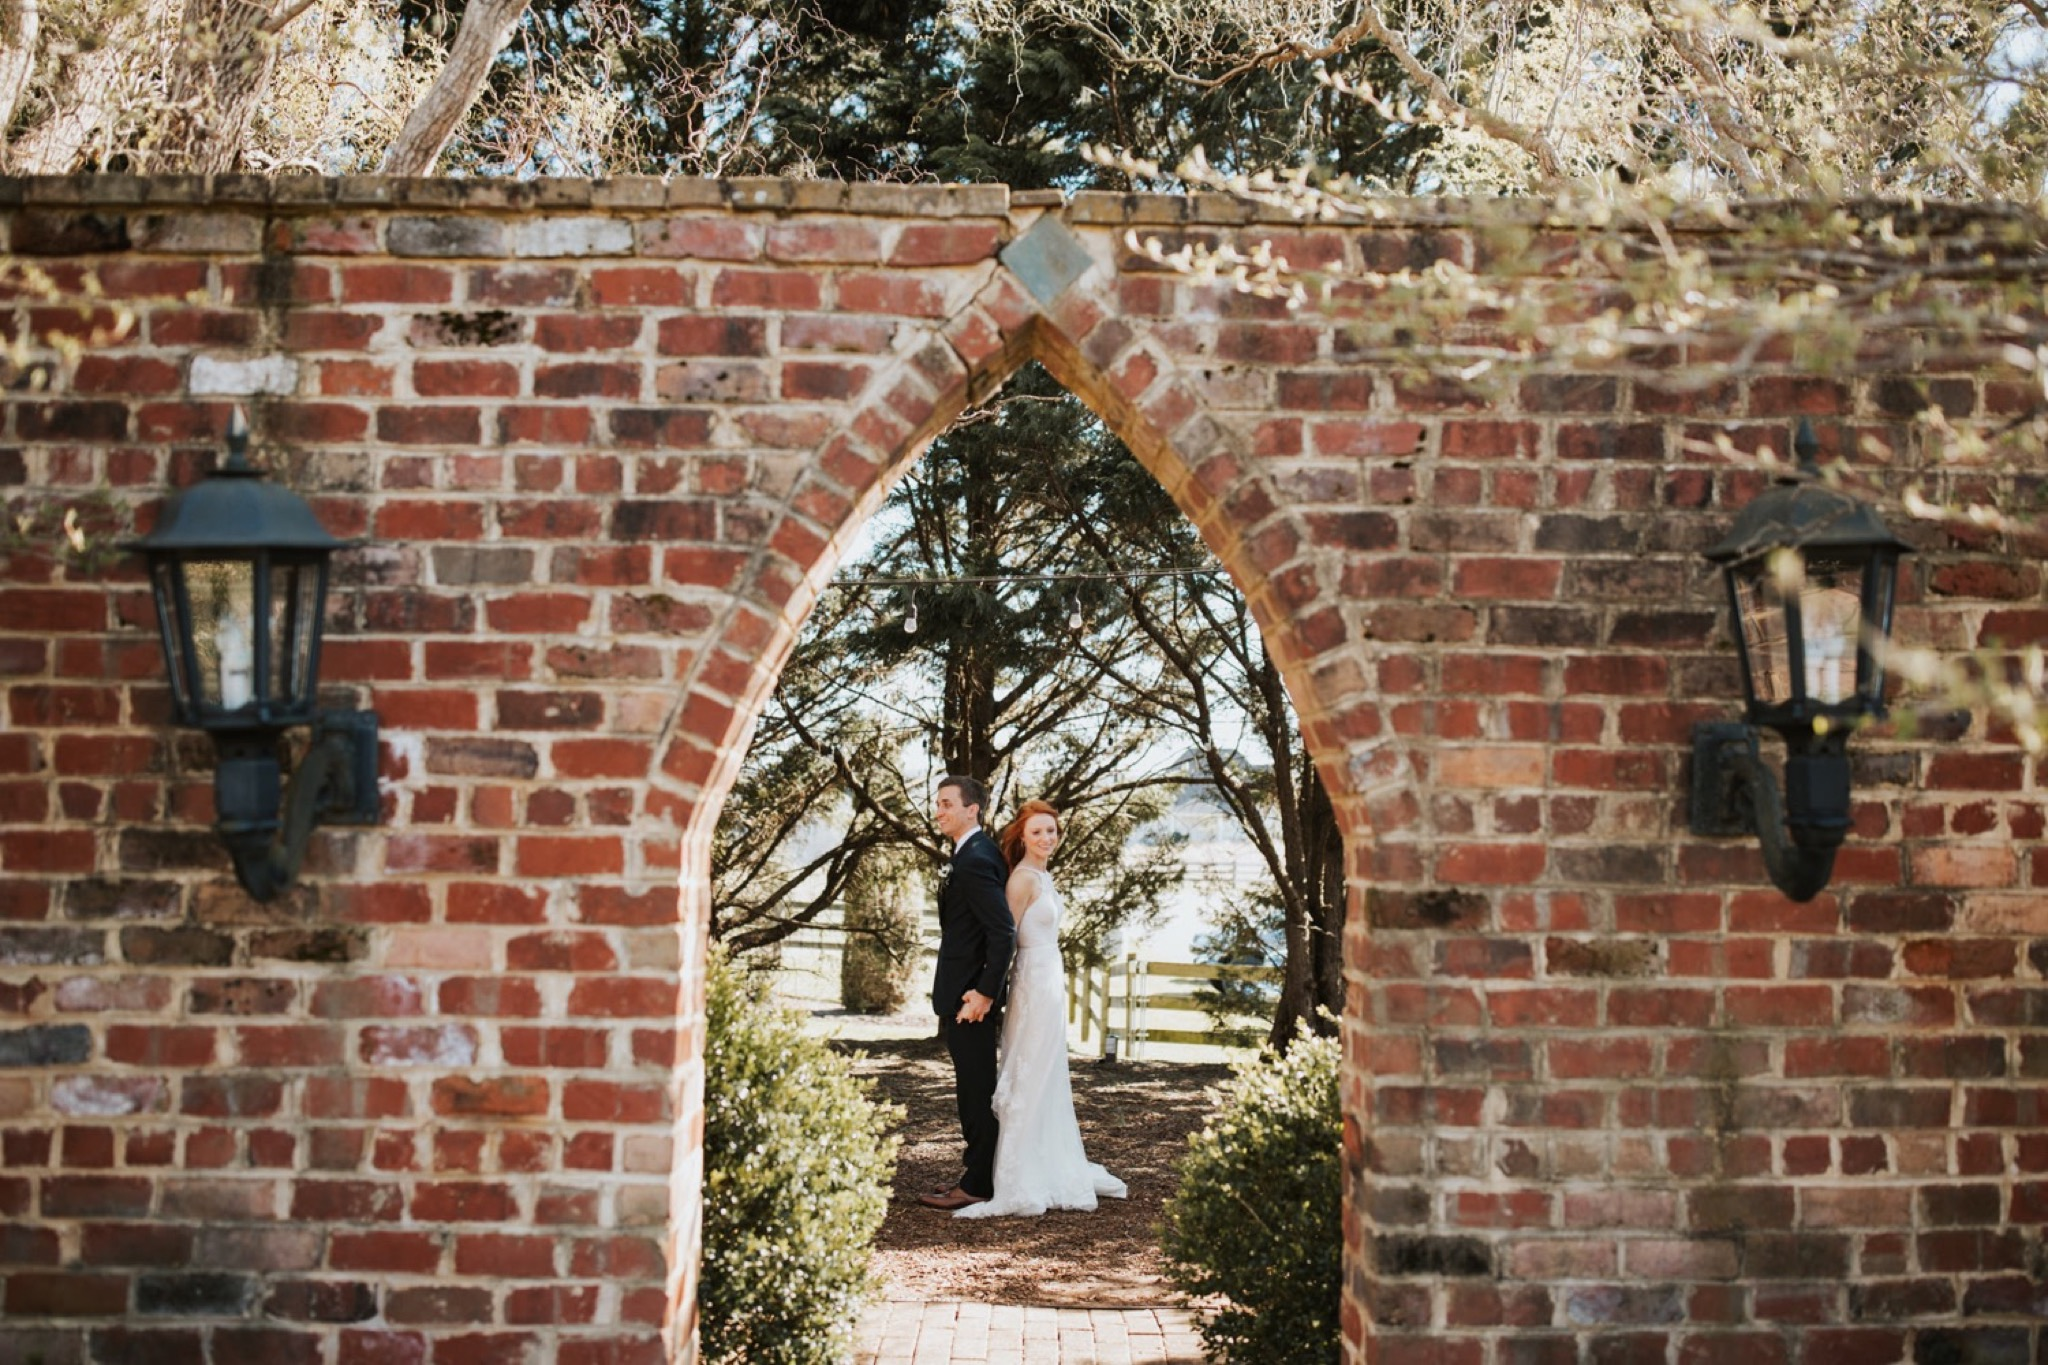 35_West Manor Estate Weddings - Pat Cori Photography-76_VirginiaWeddingPhotographer_Firstlook_WestManorEstate_PatCoriPhotography_Portraits.jpg